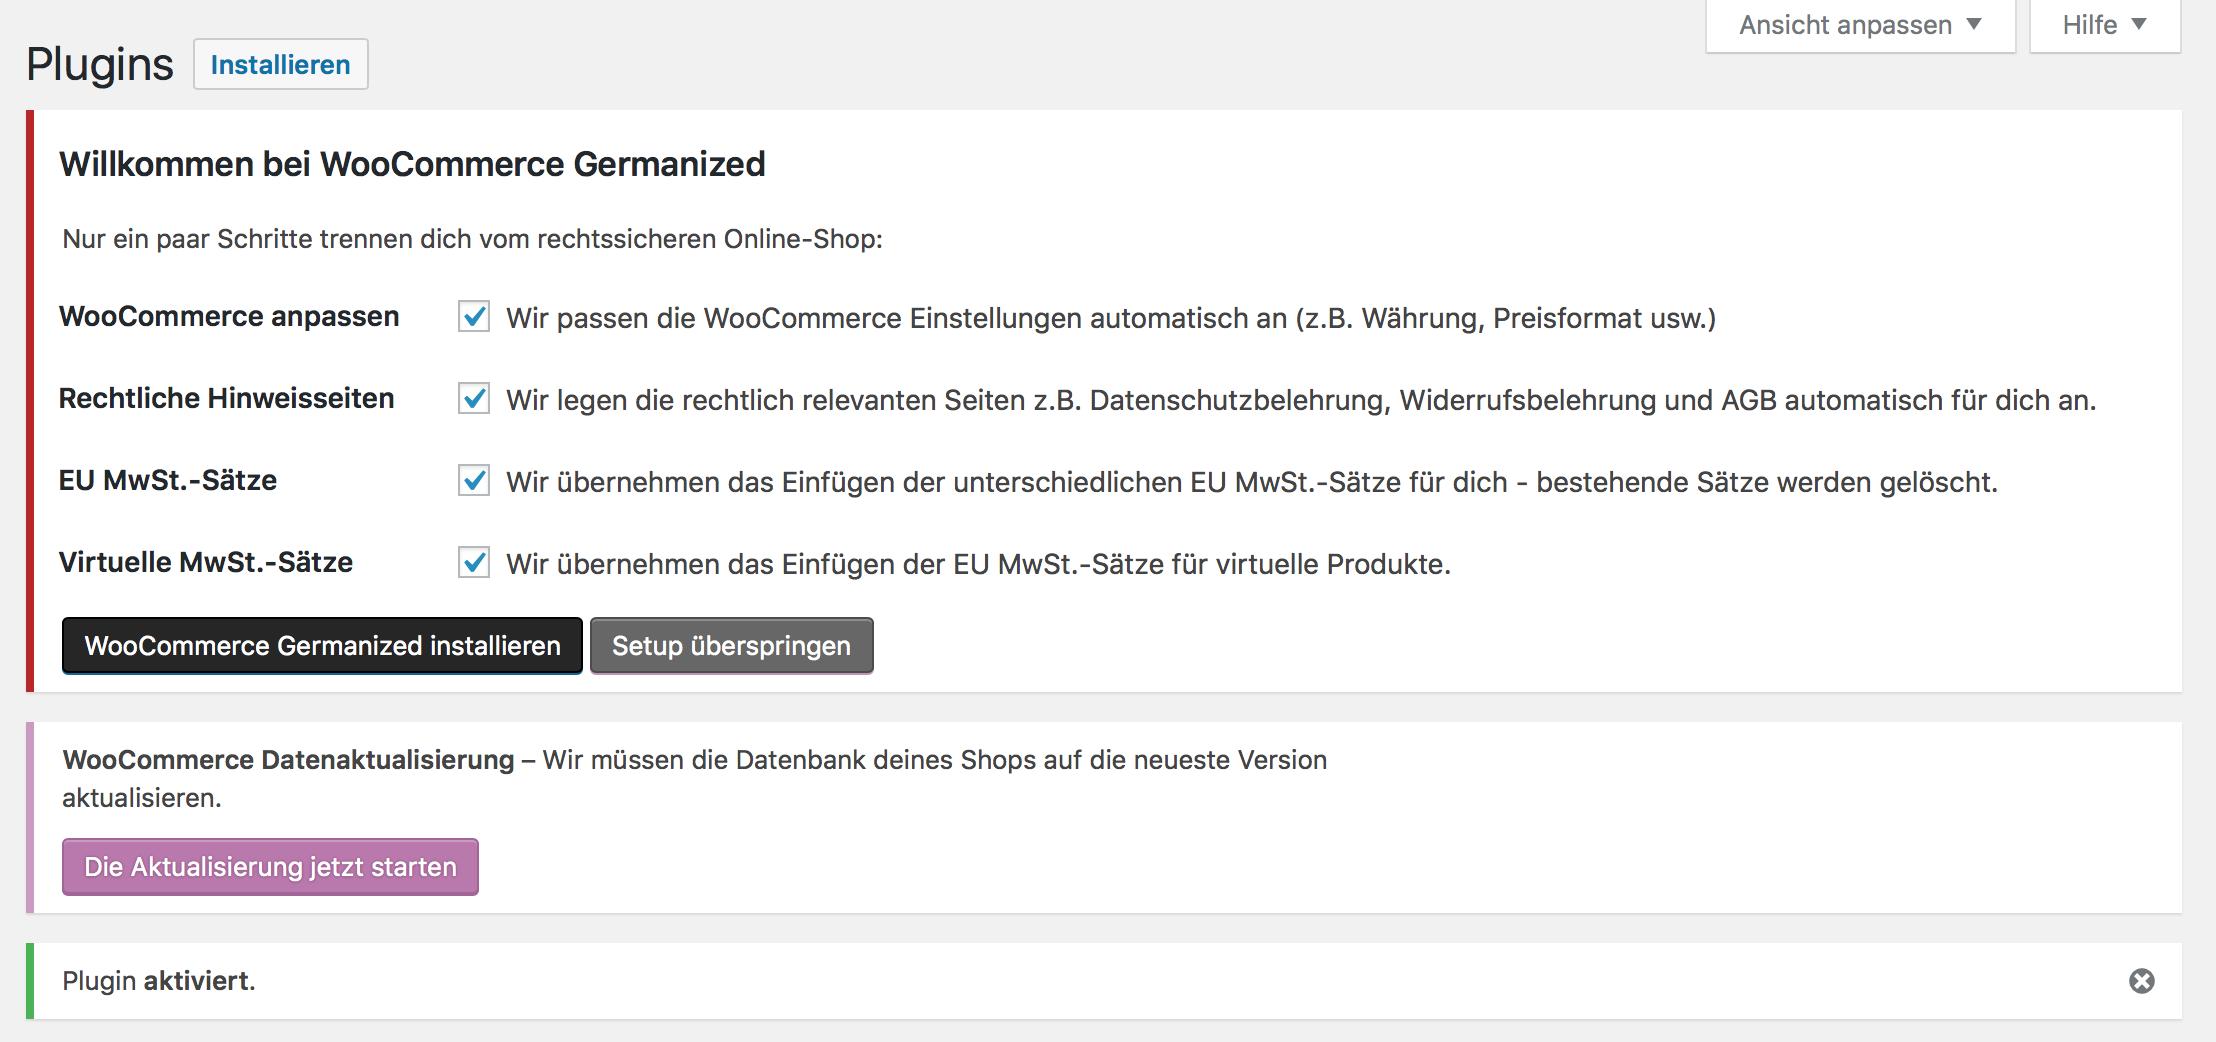 WooCommerce Germanized Datensätze importieren